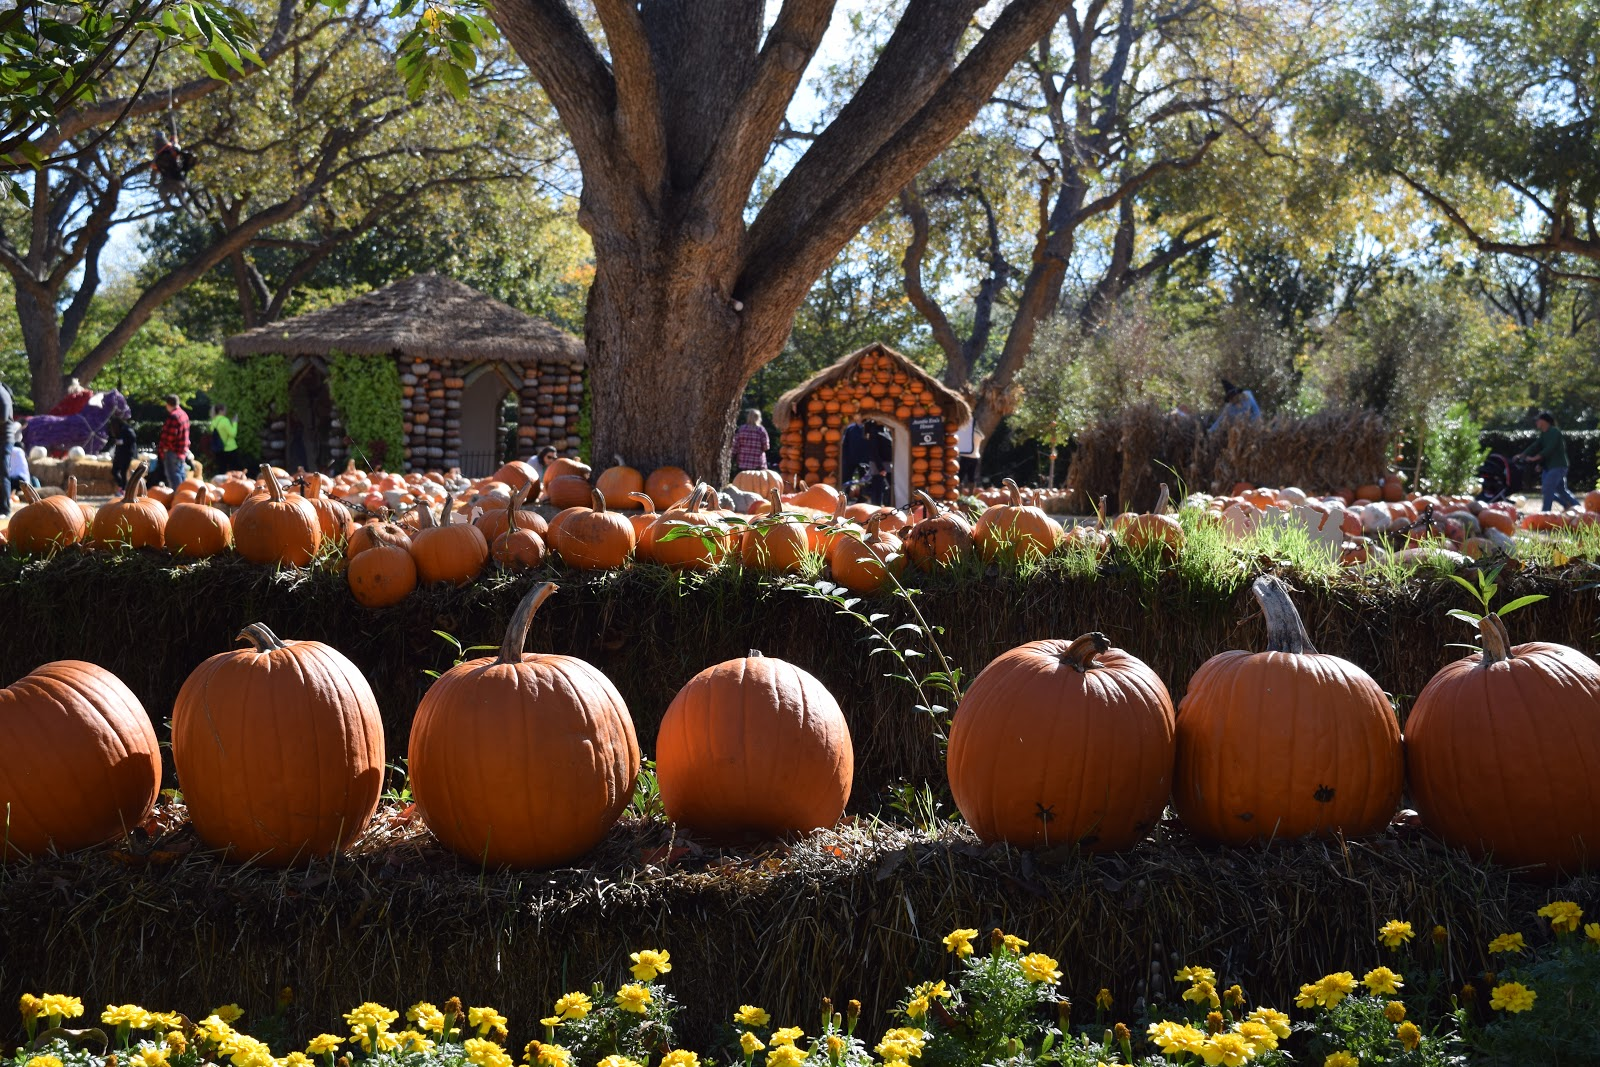 Travel for a Purpose: Autumn Colors at Dallas Arboretum Botanical Garden